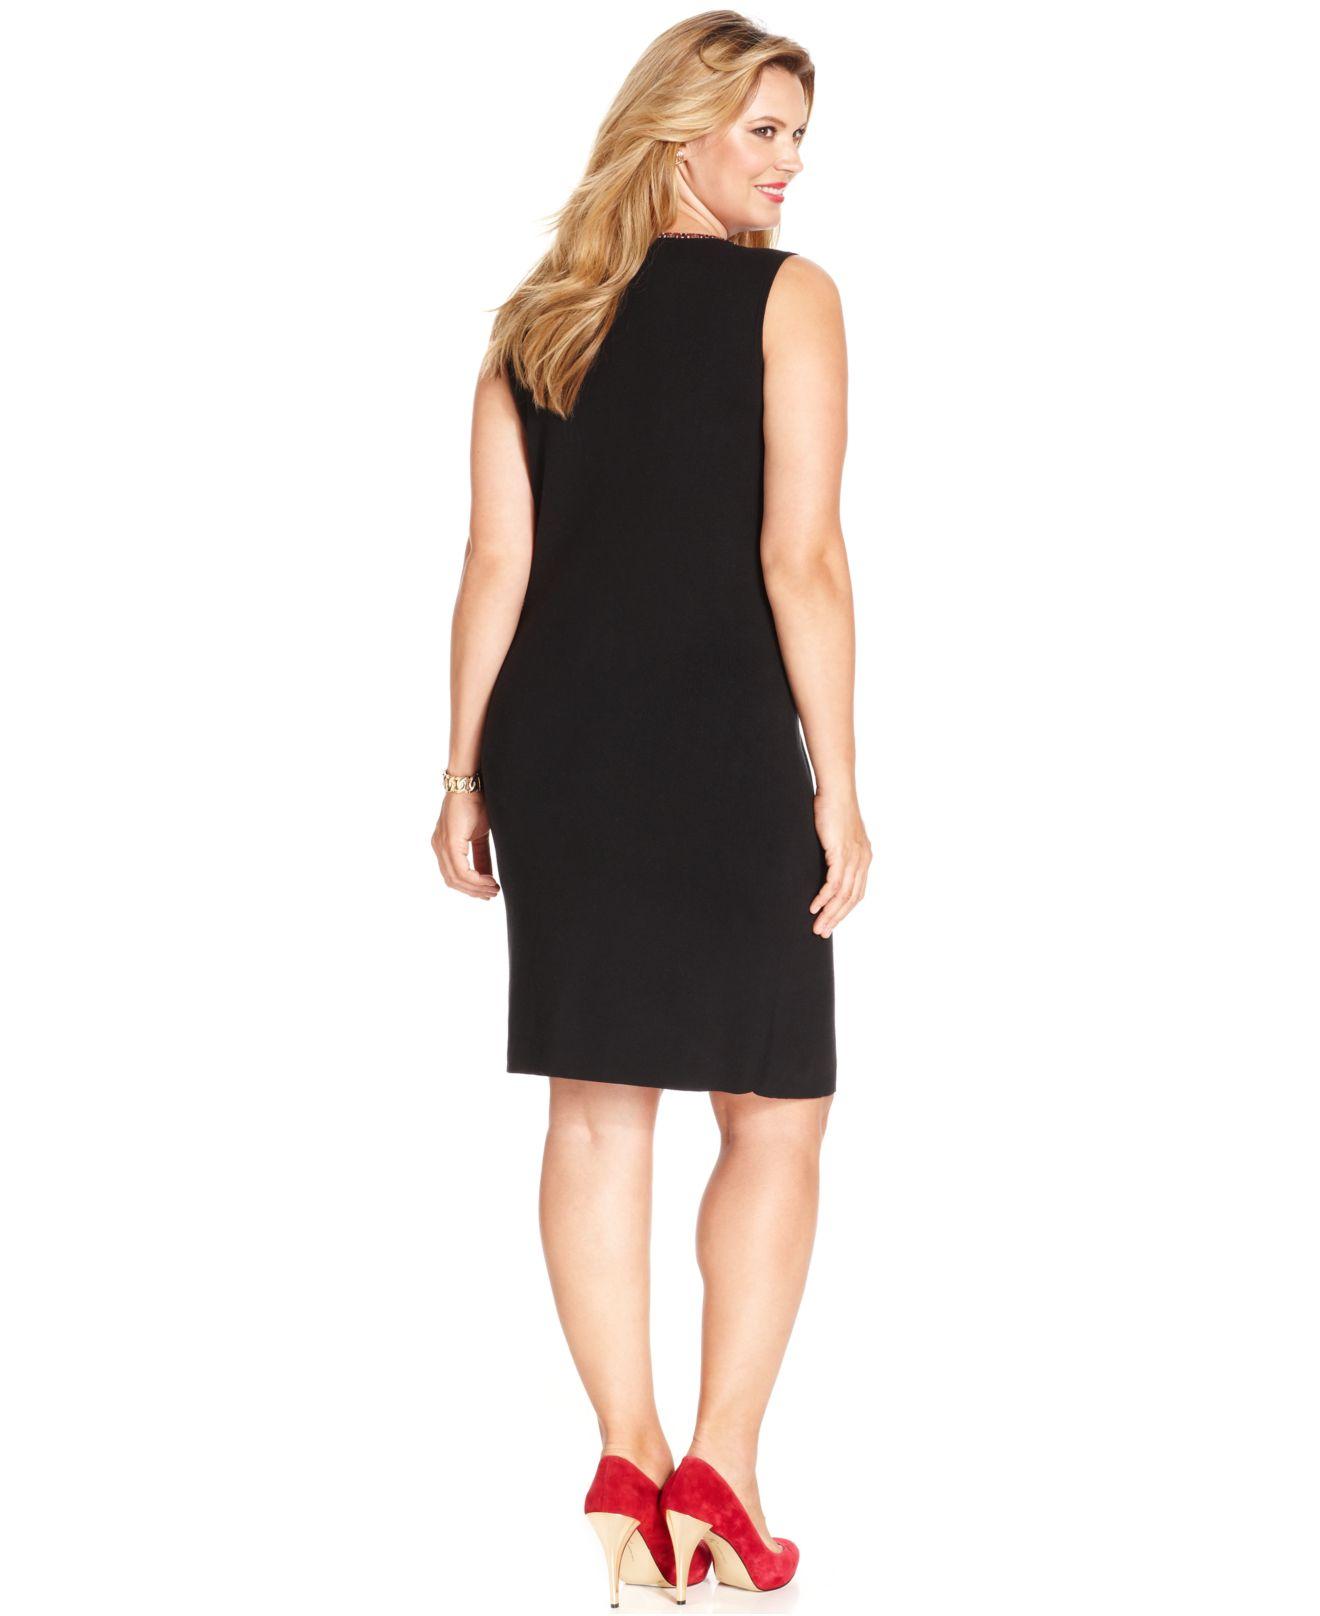 bcbe2855a58 Lyst - Jones New York Signature Plus Size Sleeveless Sweater Dress ...